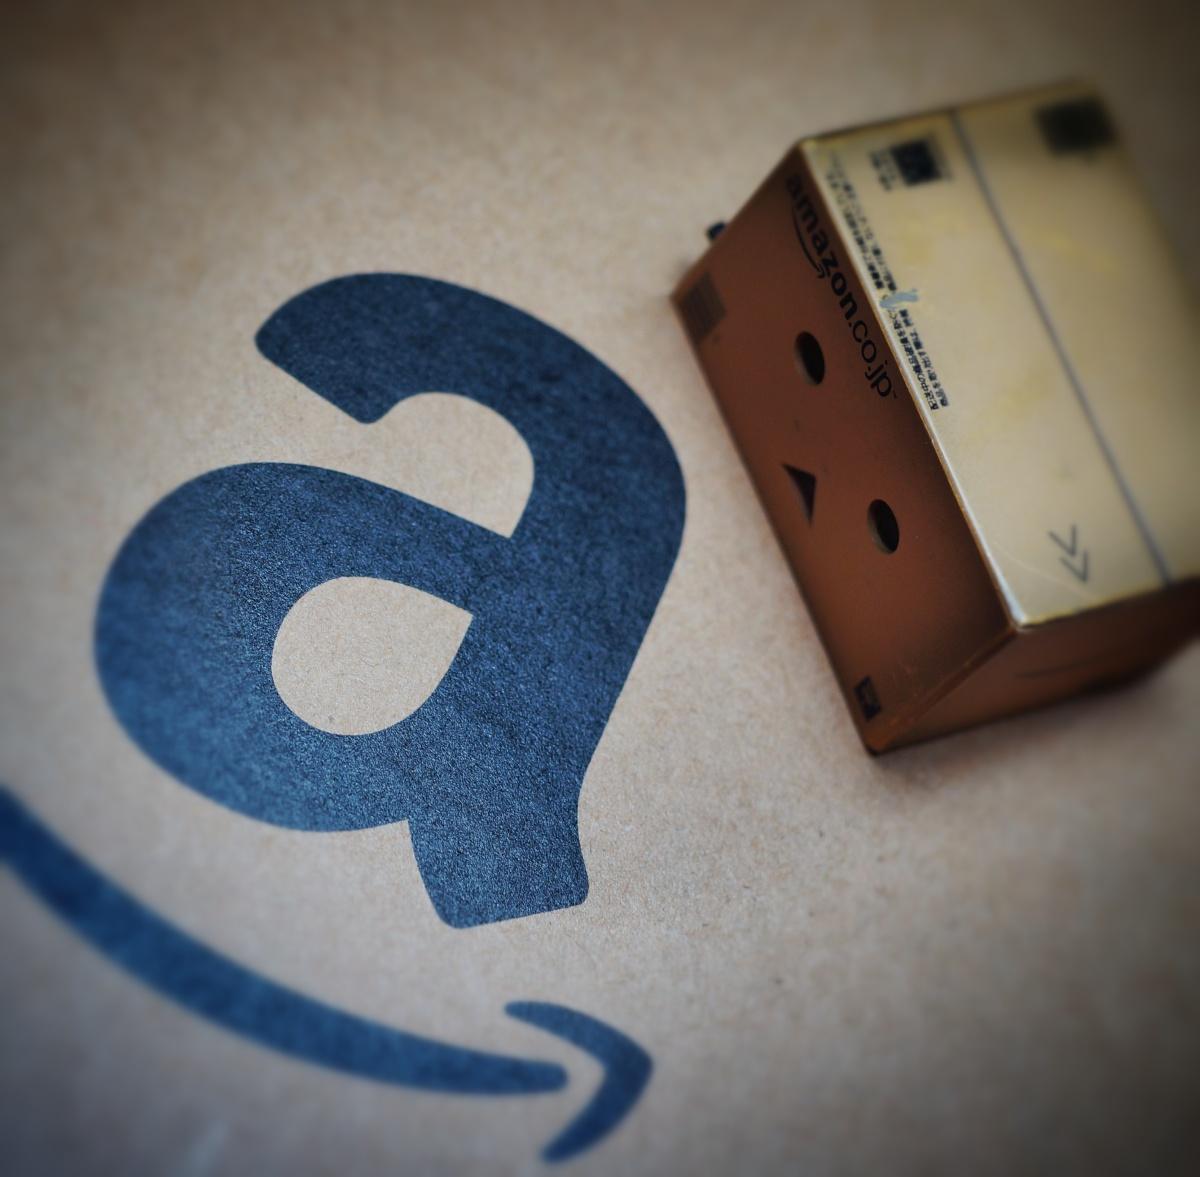 Amazon box.